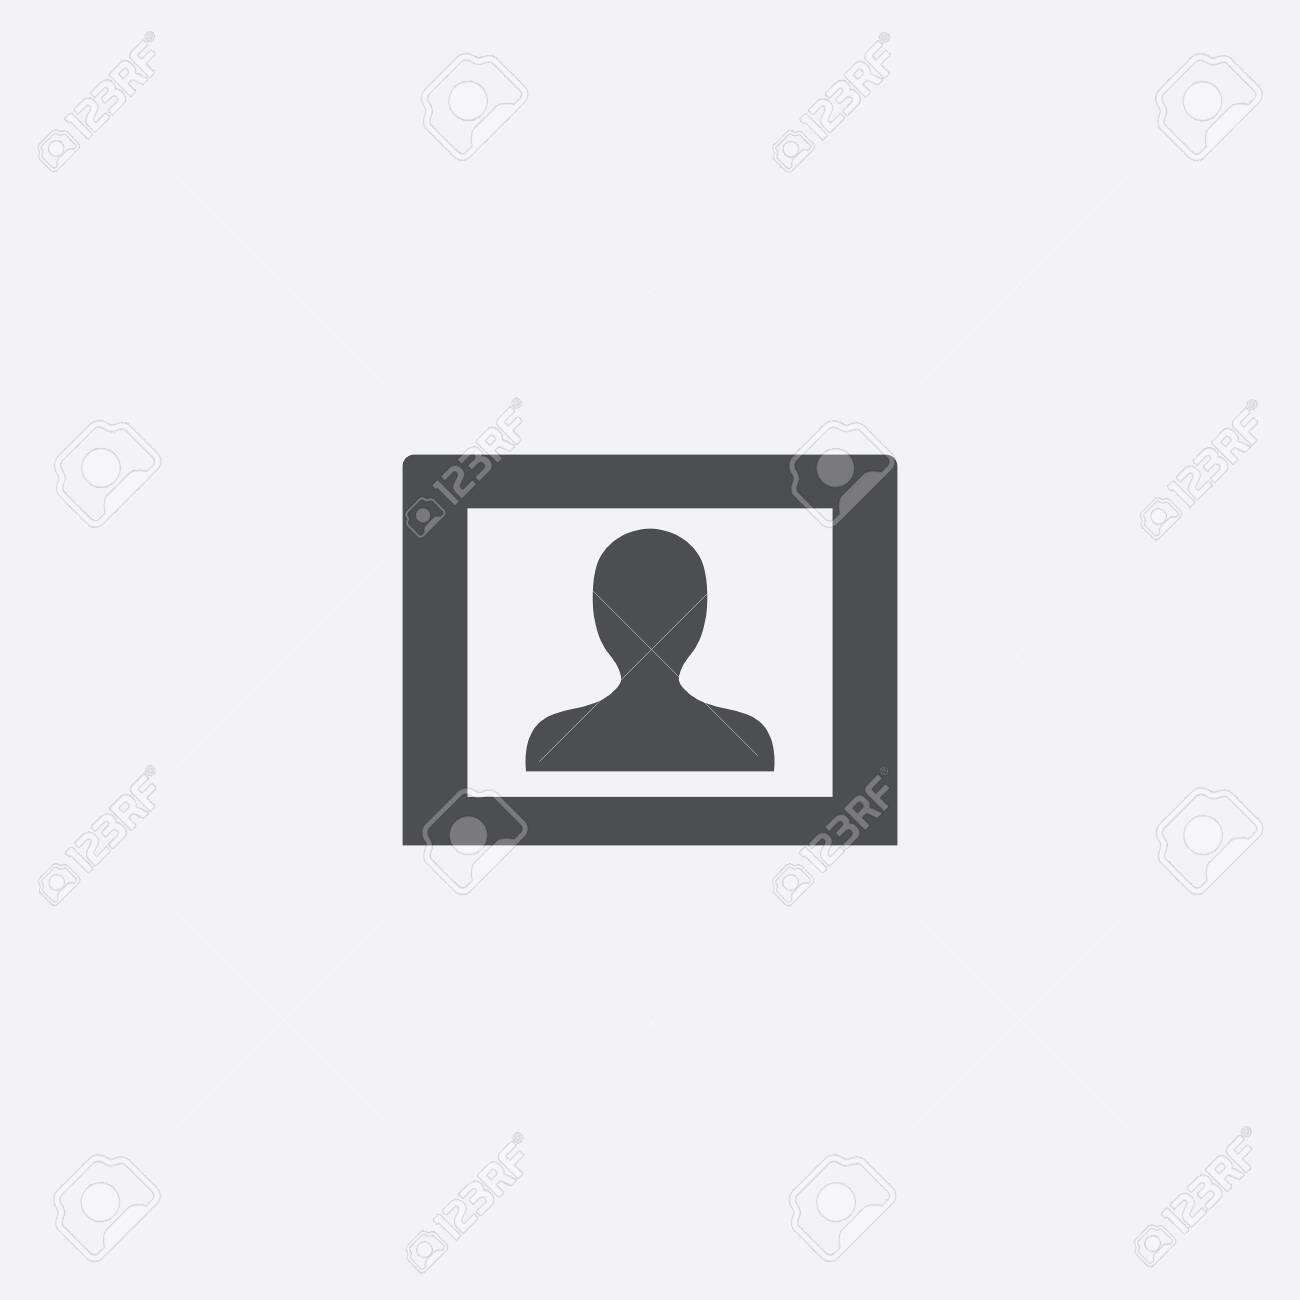 picture icon - 143431830